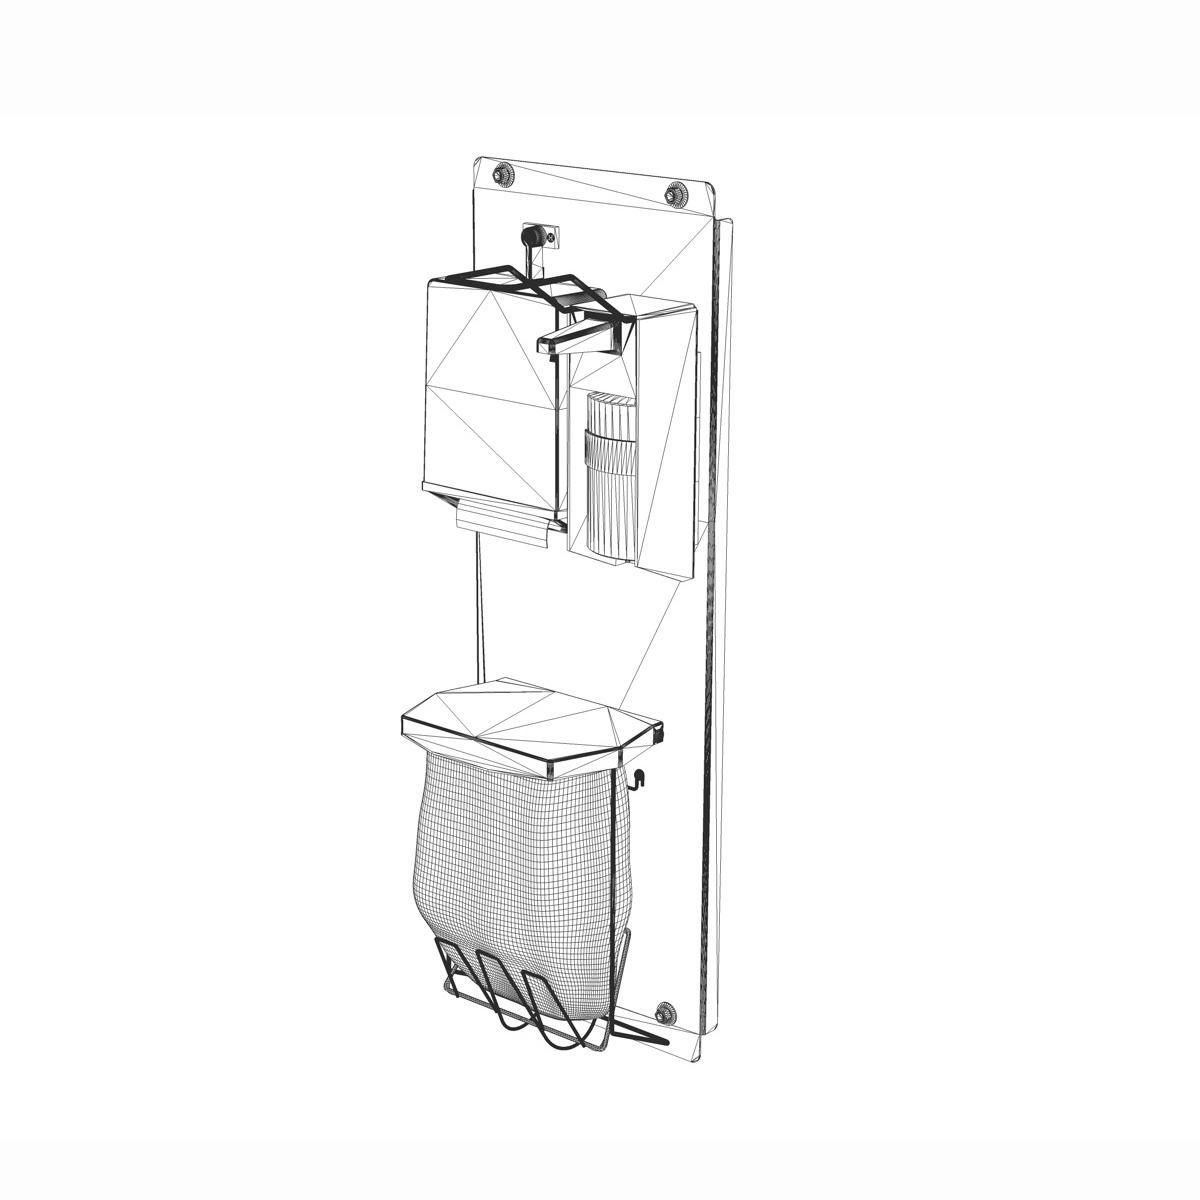 hand sanitizer station 3d model 3ds c4d lwo obj 264464